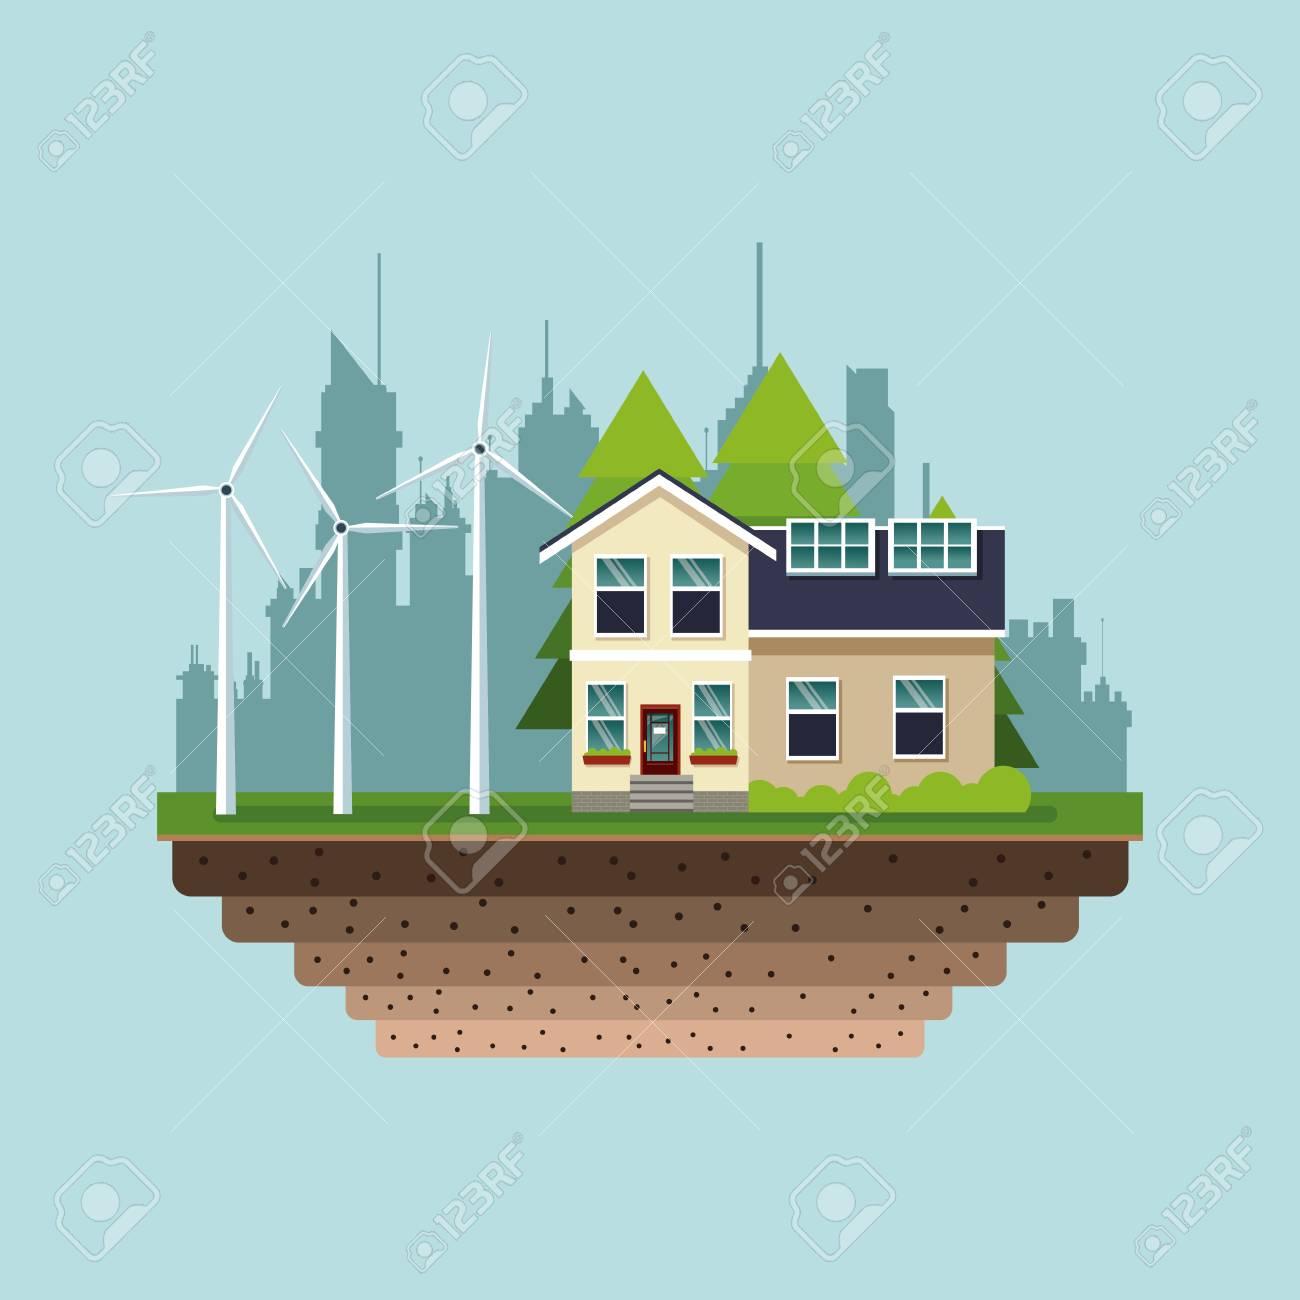 Maison moderne énergie verte vent turbine ville fond illustration  vectorielle